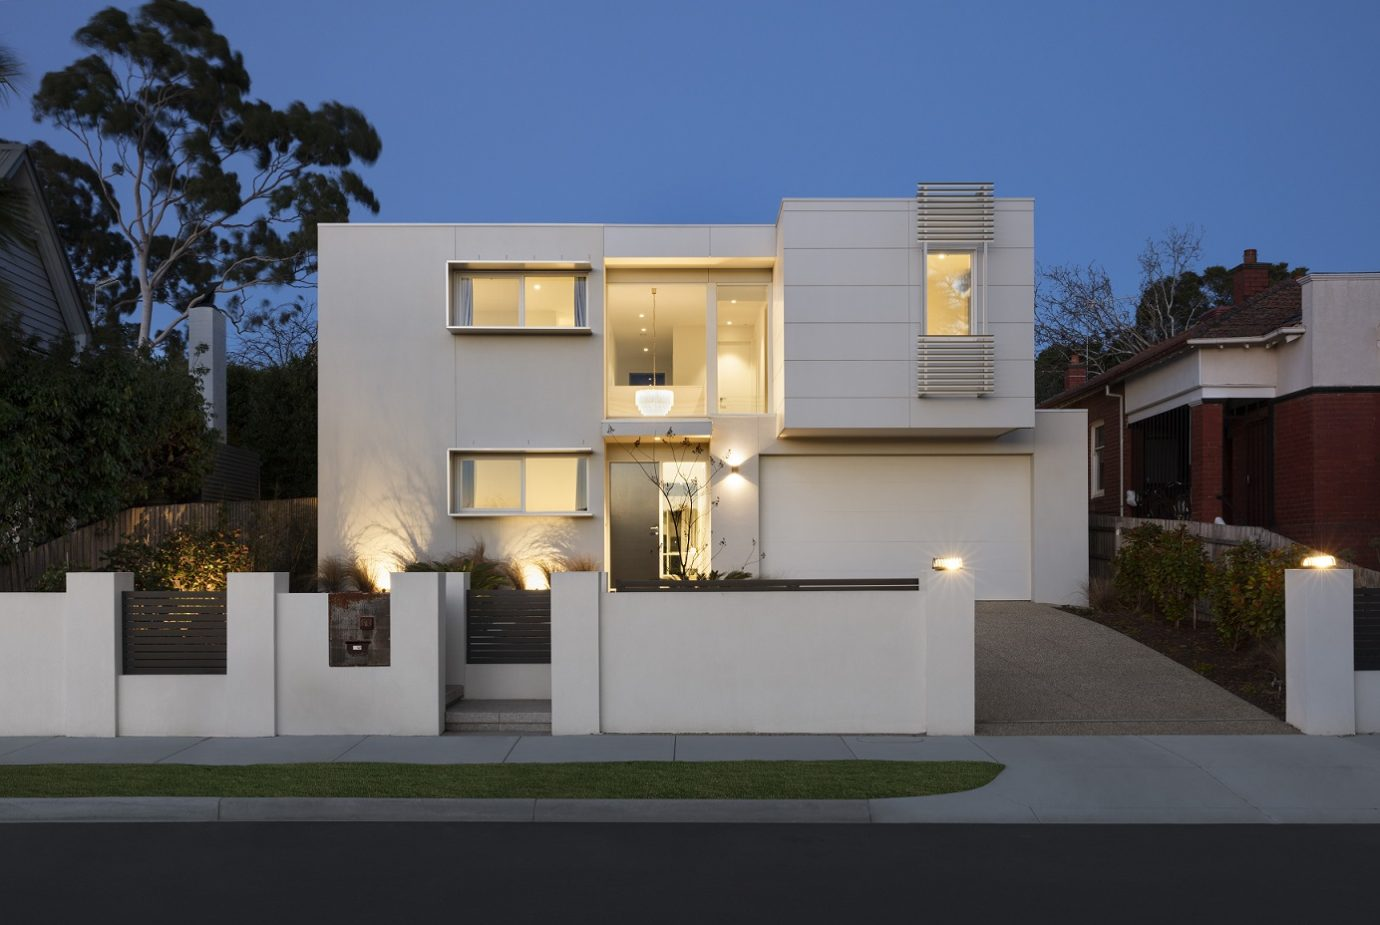 Hero image - new-display-home-100-yarralea-street-alphington-open-inspiration-saturday-sunday-1-5-pm-2